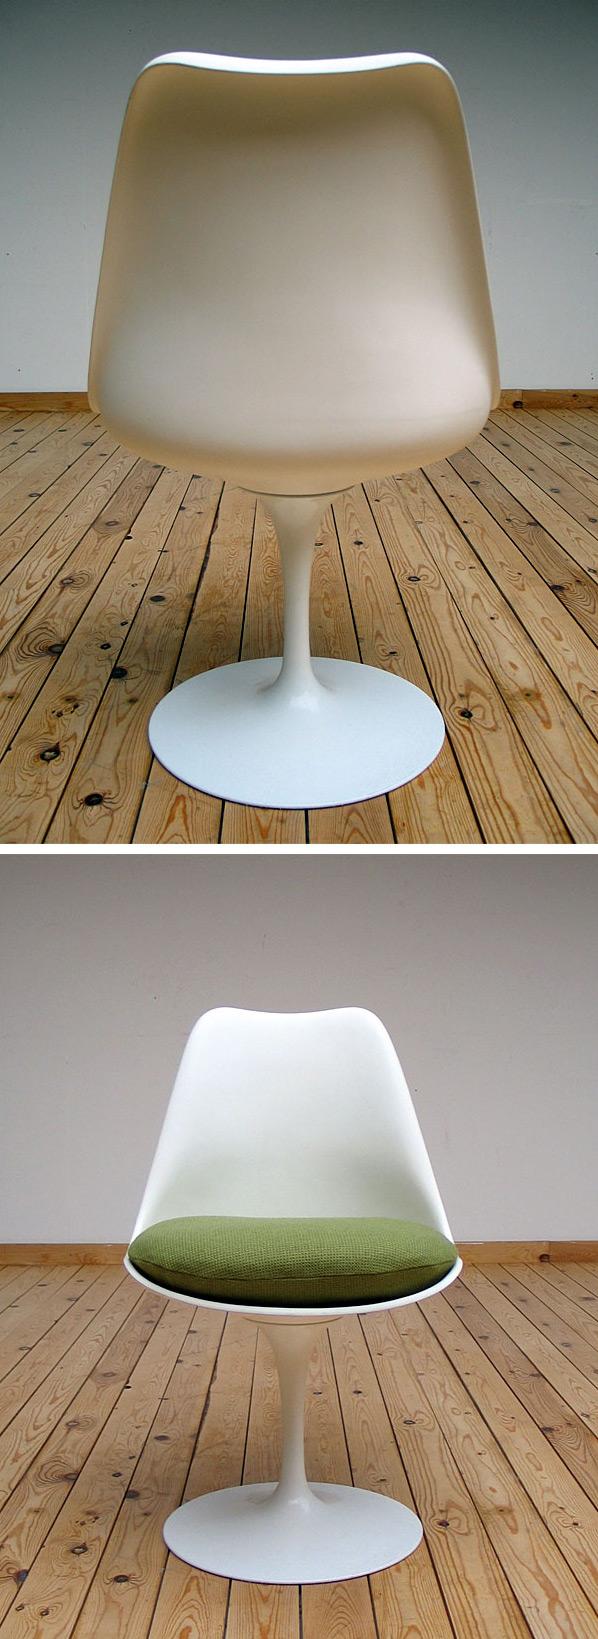 Eero Saarinen Tulip Chair 1957 Knoll international Large